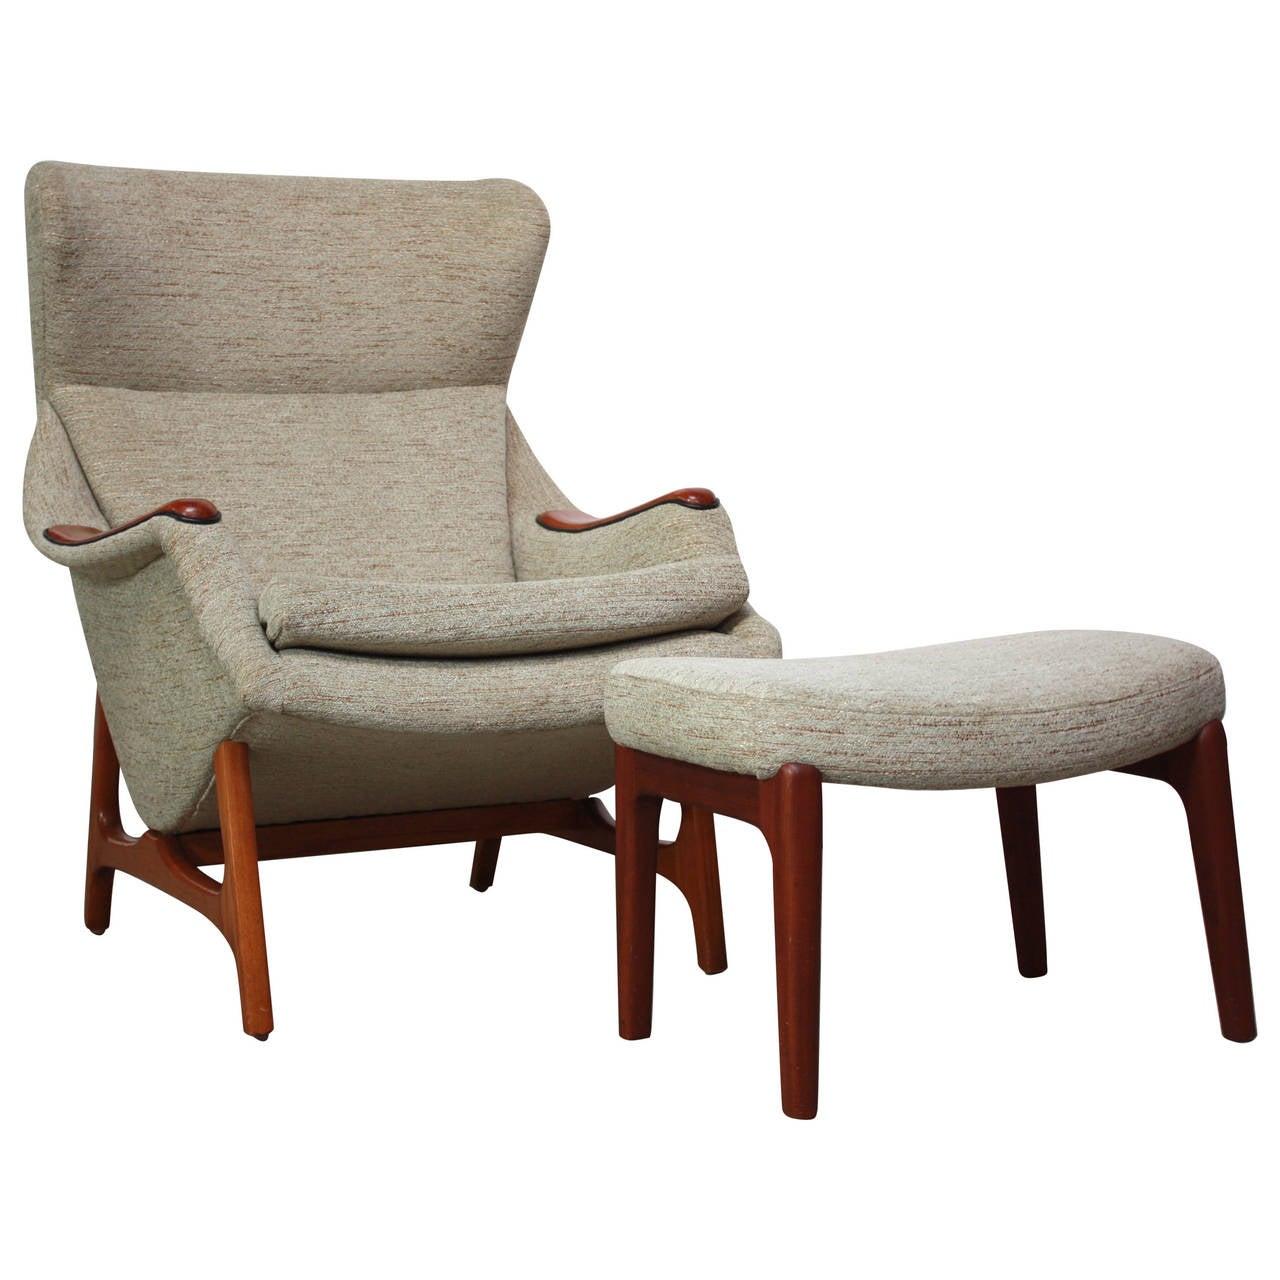 B J Hansen Norwegian Lounge Chair and Ottoman at 1stdibs